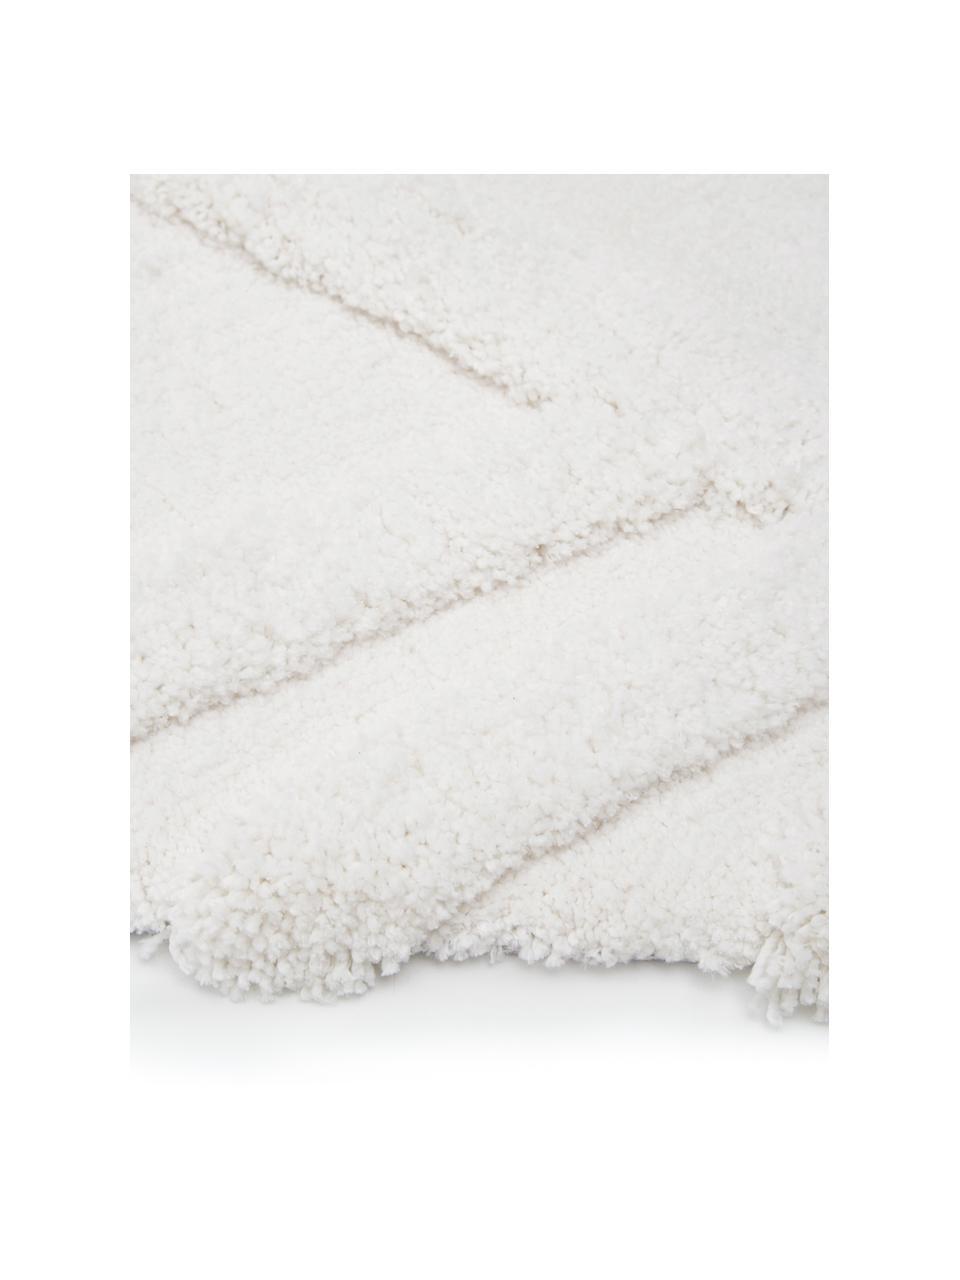 Fluffy boho hoogpolig vloerkleed Magda met verhoogd hoog-laag patroon, Bovenzijde: 100% polyester (microveze, Onderzijde: 55% polyester, 45% katoen, Beige, B 200 x L 300 cm (maat L)